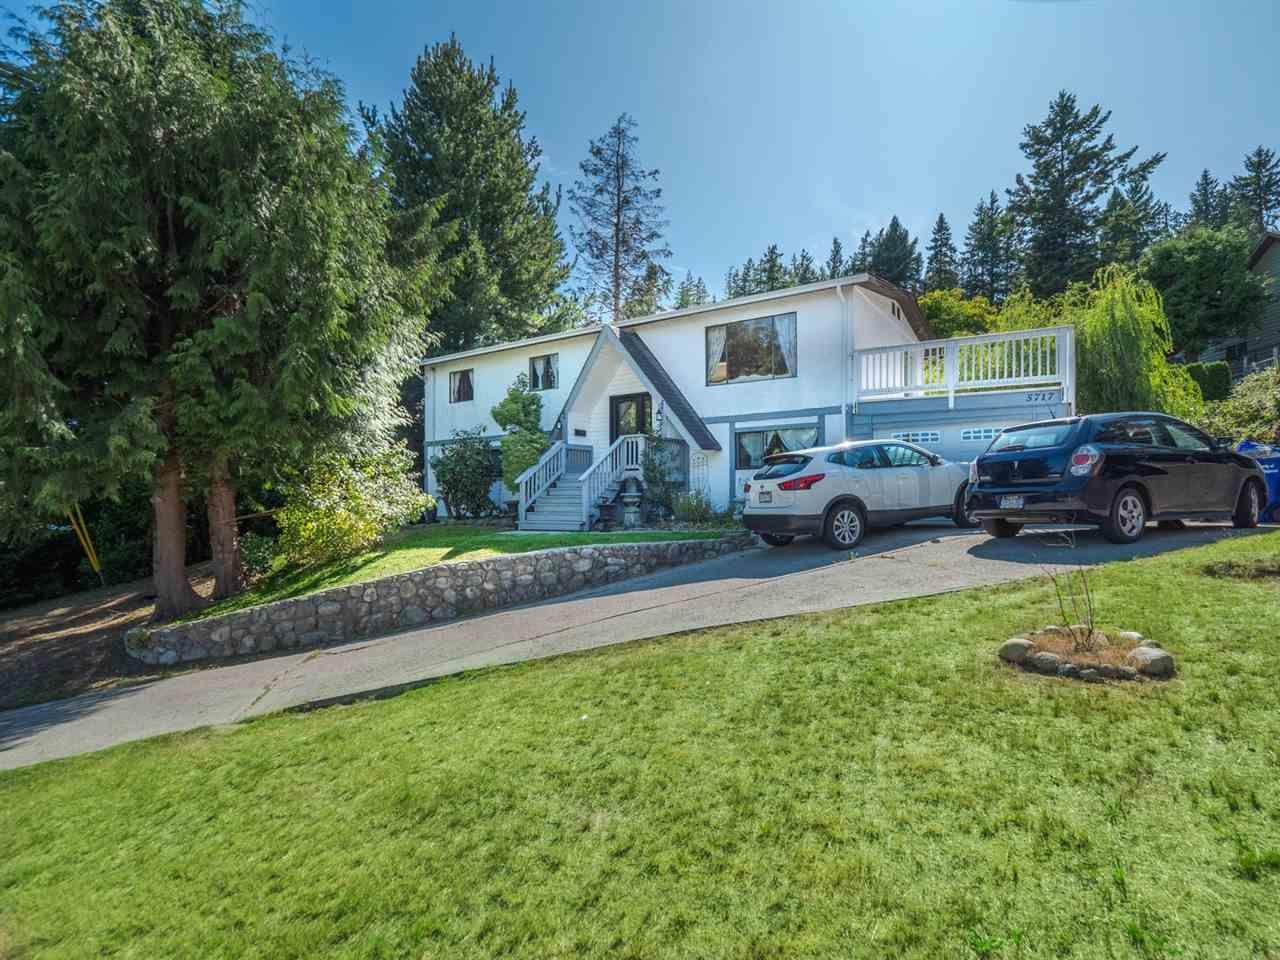 Main Photo: 5717 TRAIL Avenue in Sechelt: Sechelt District House for sale (Sunshine Coast)  : MLS®# R2546289